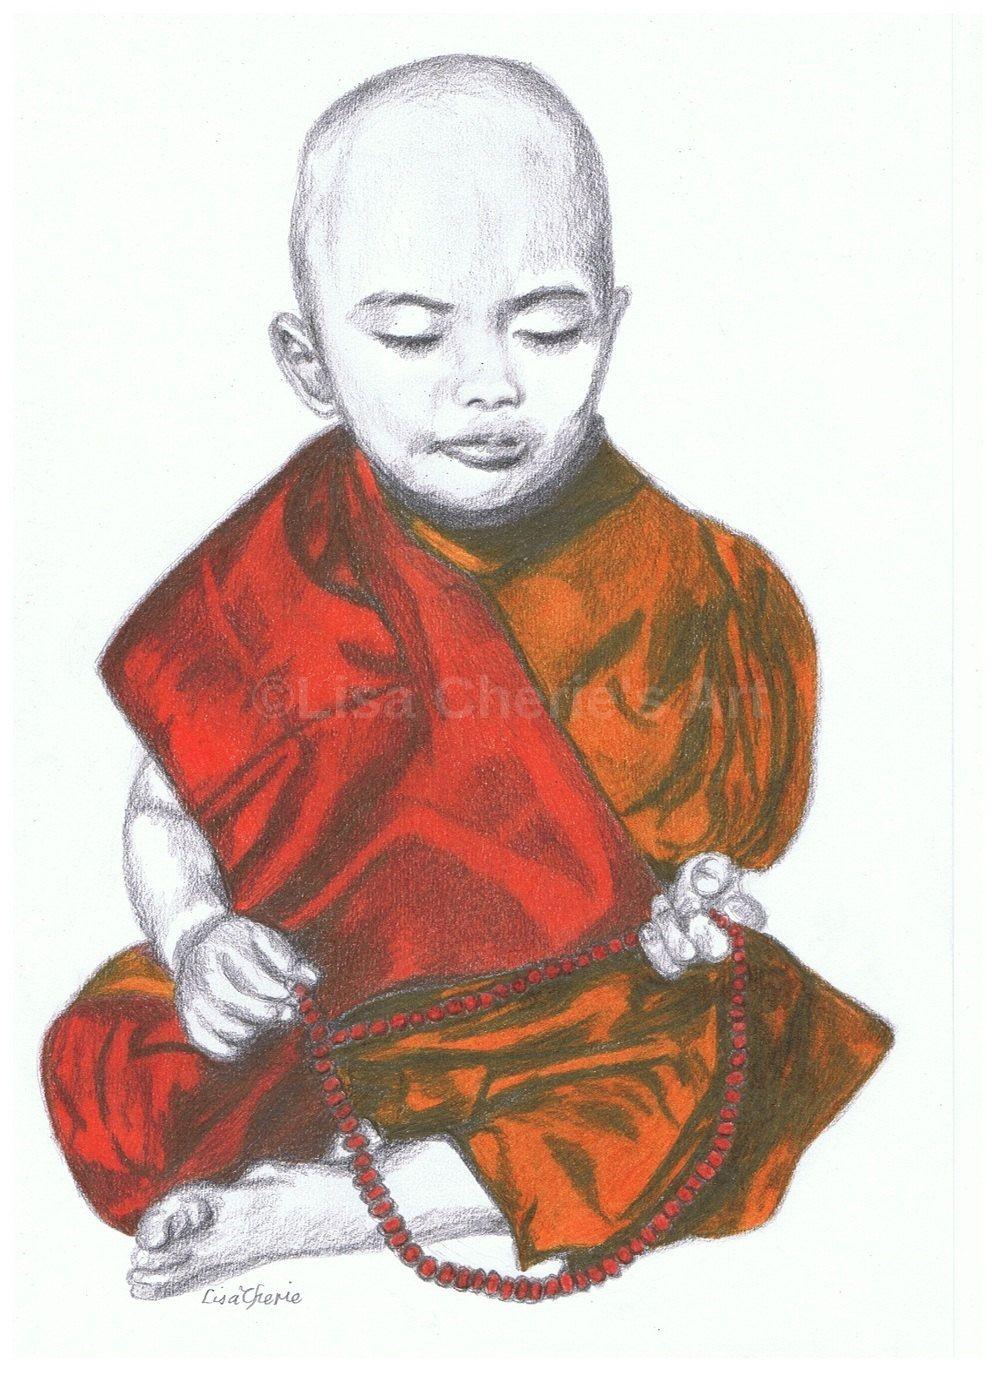 1000x1375 Monk Child With Mala Beads Original Portrait Drawing, Nursery Art